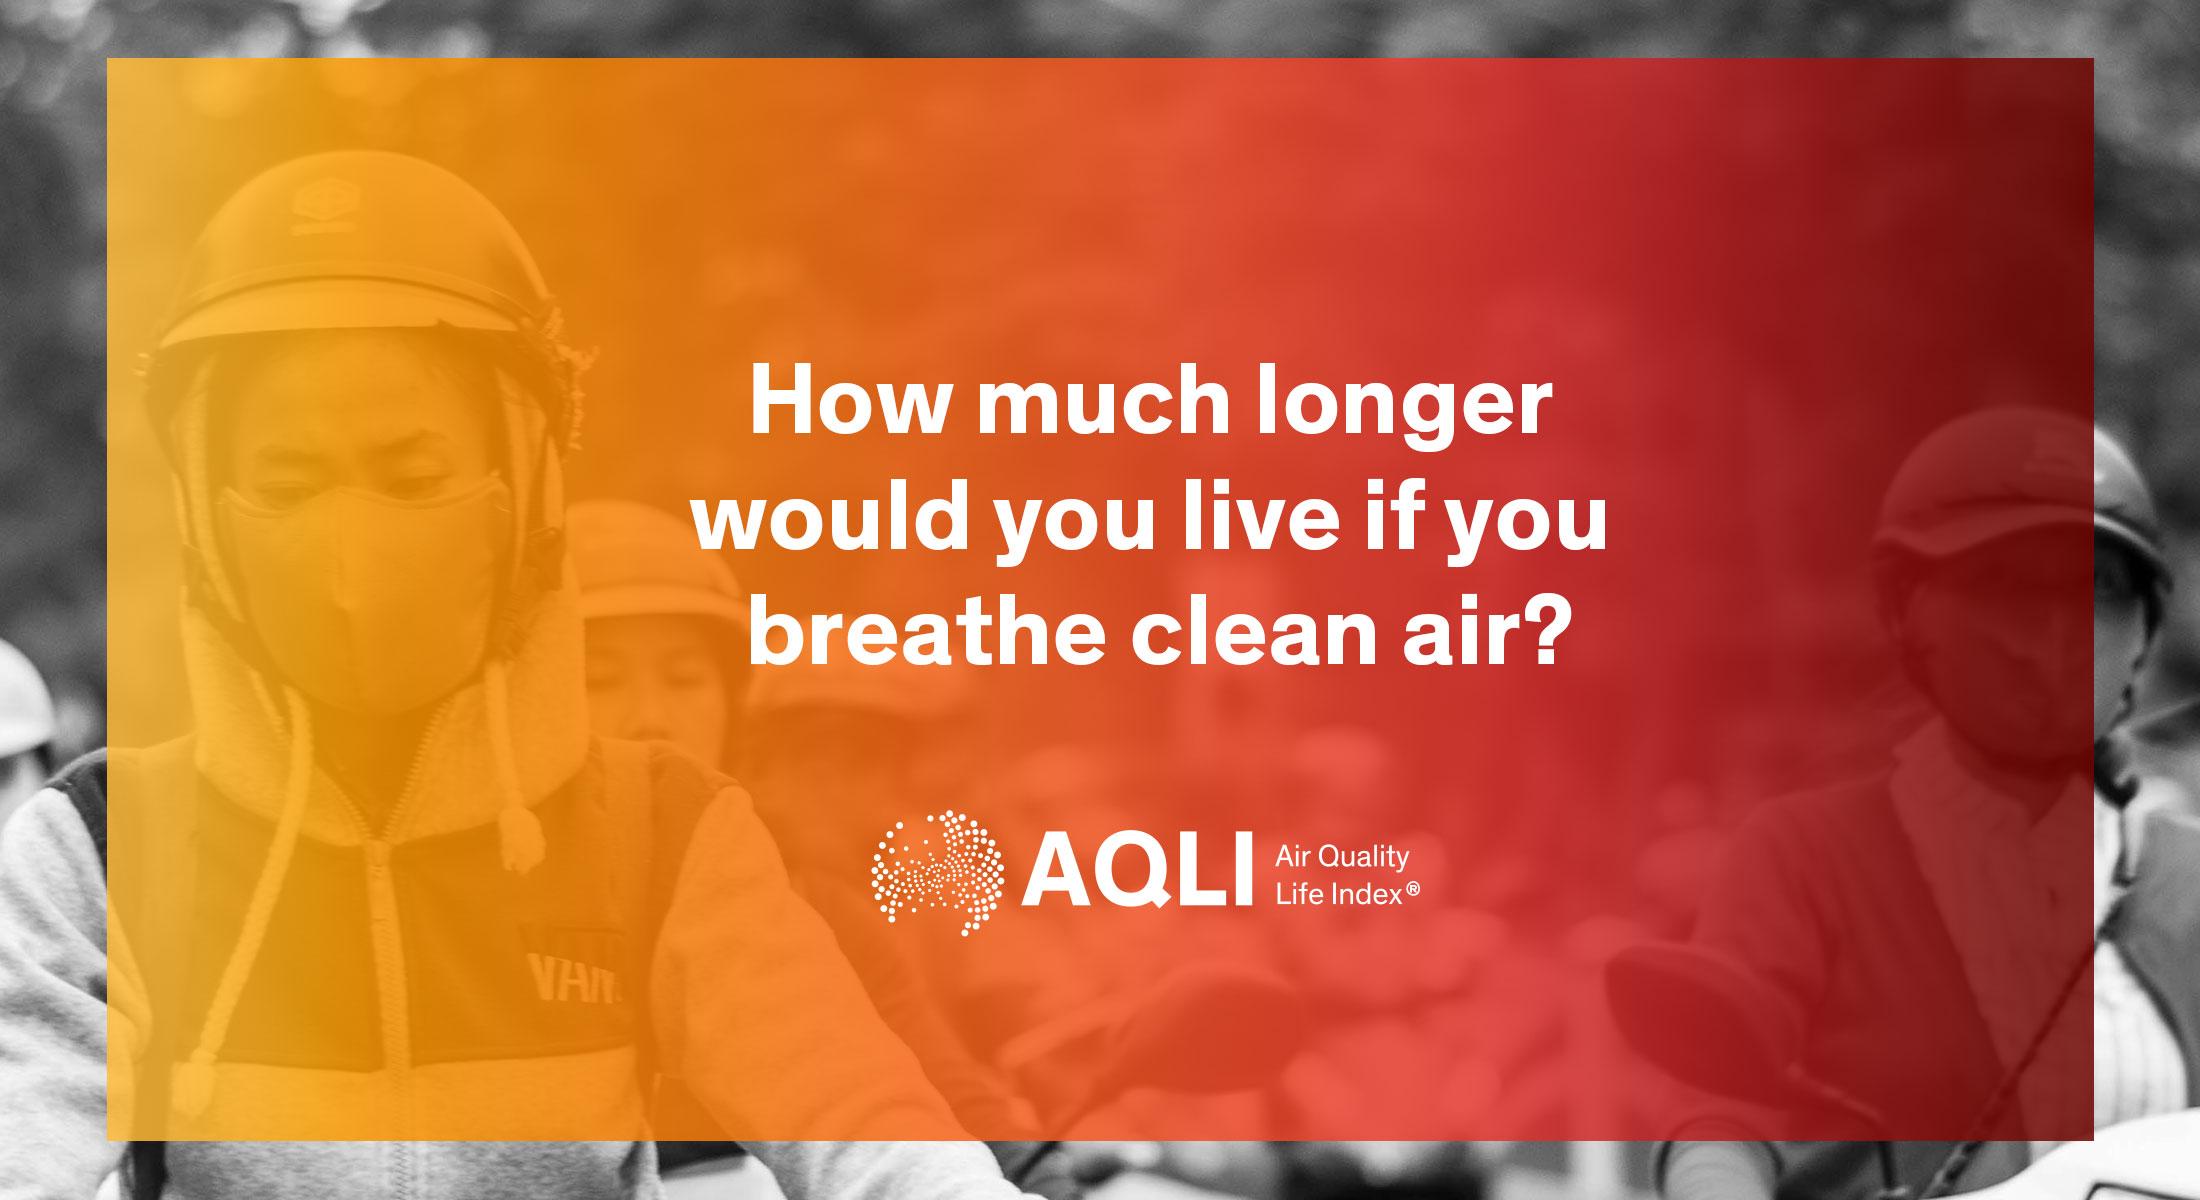 Air-quality-life-index-intro